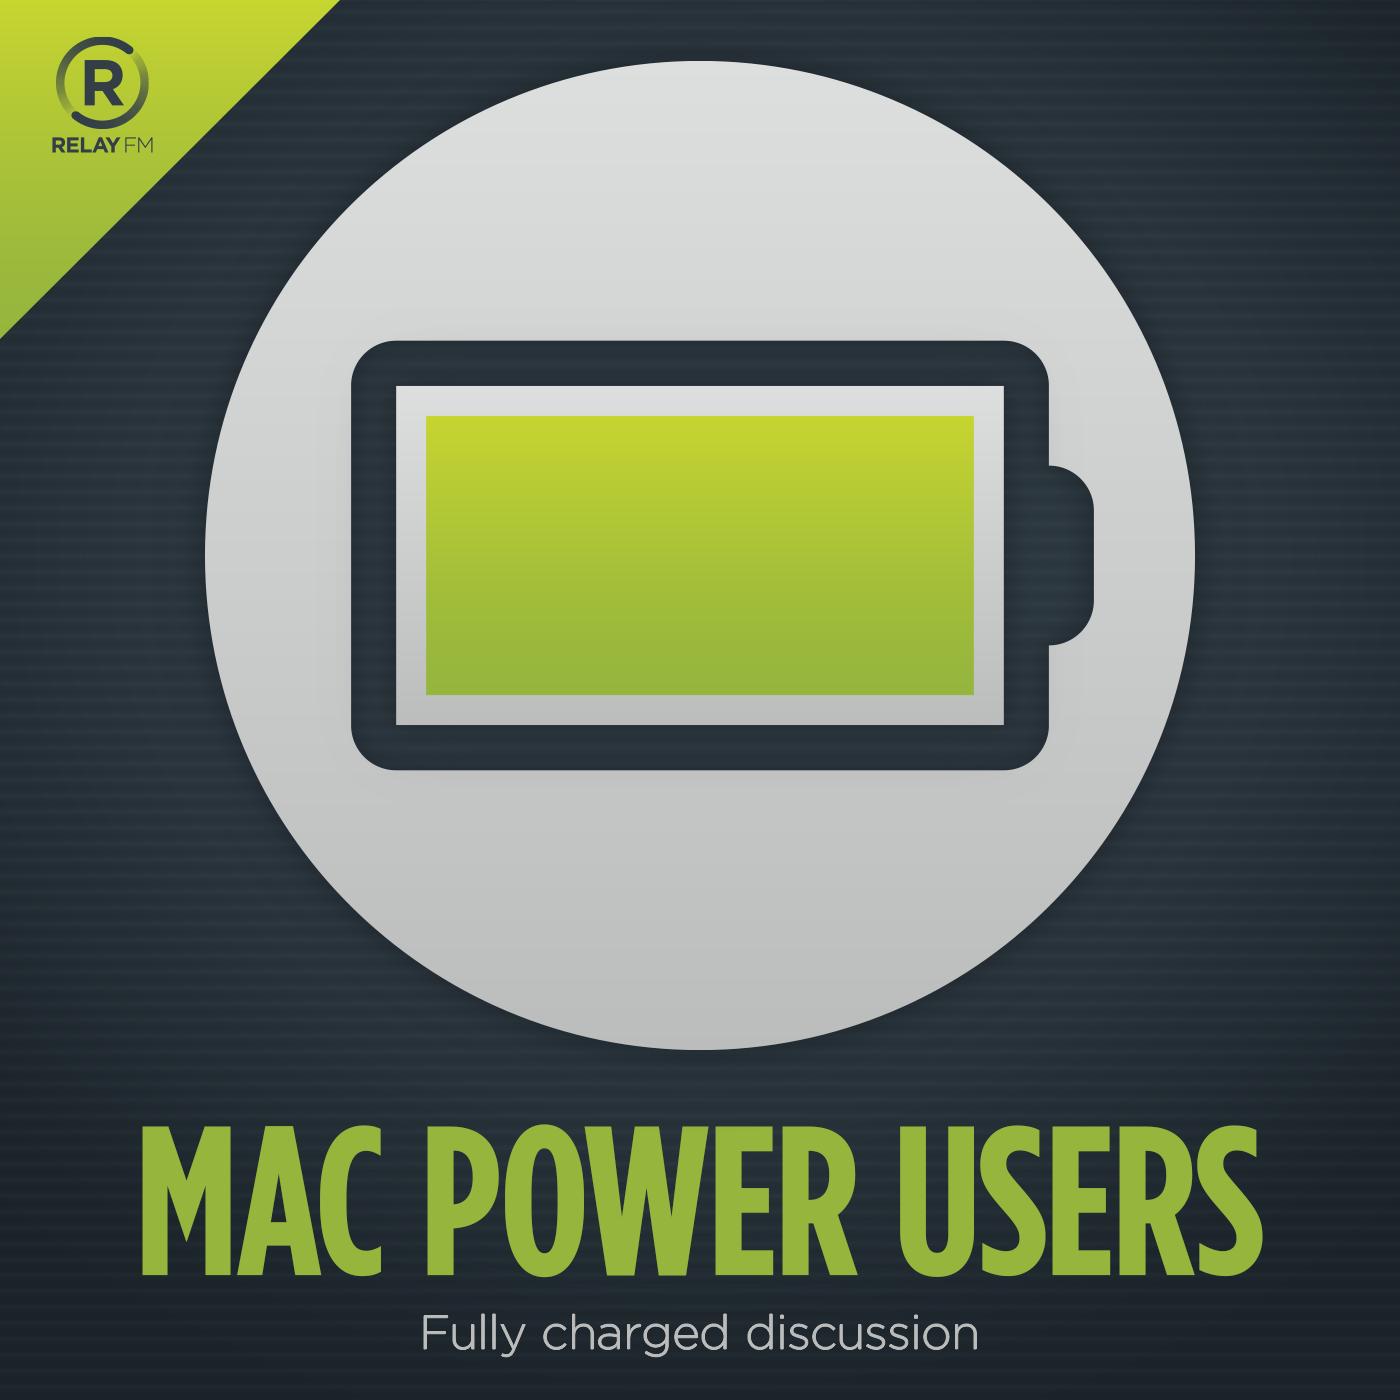 Mac Power Users logo